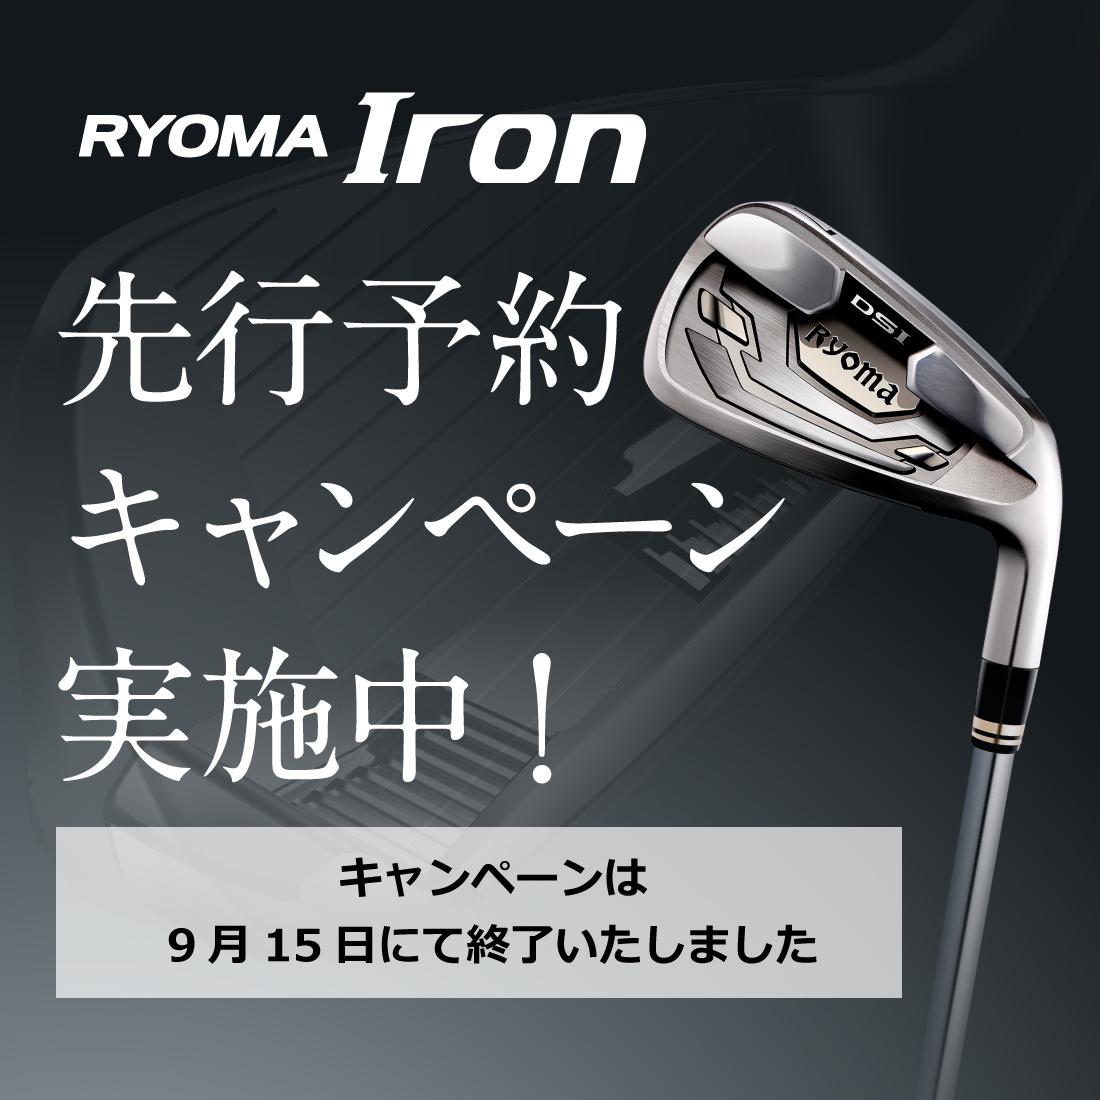 Iron reservation